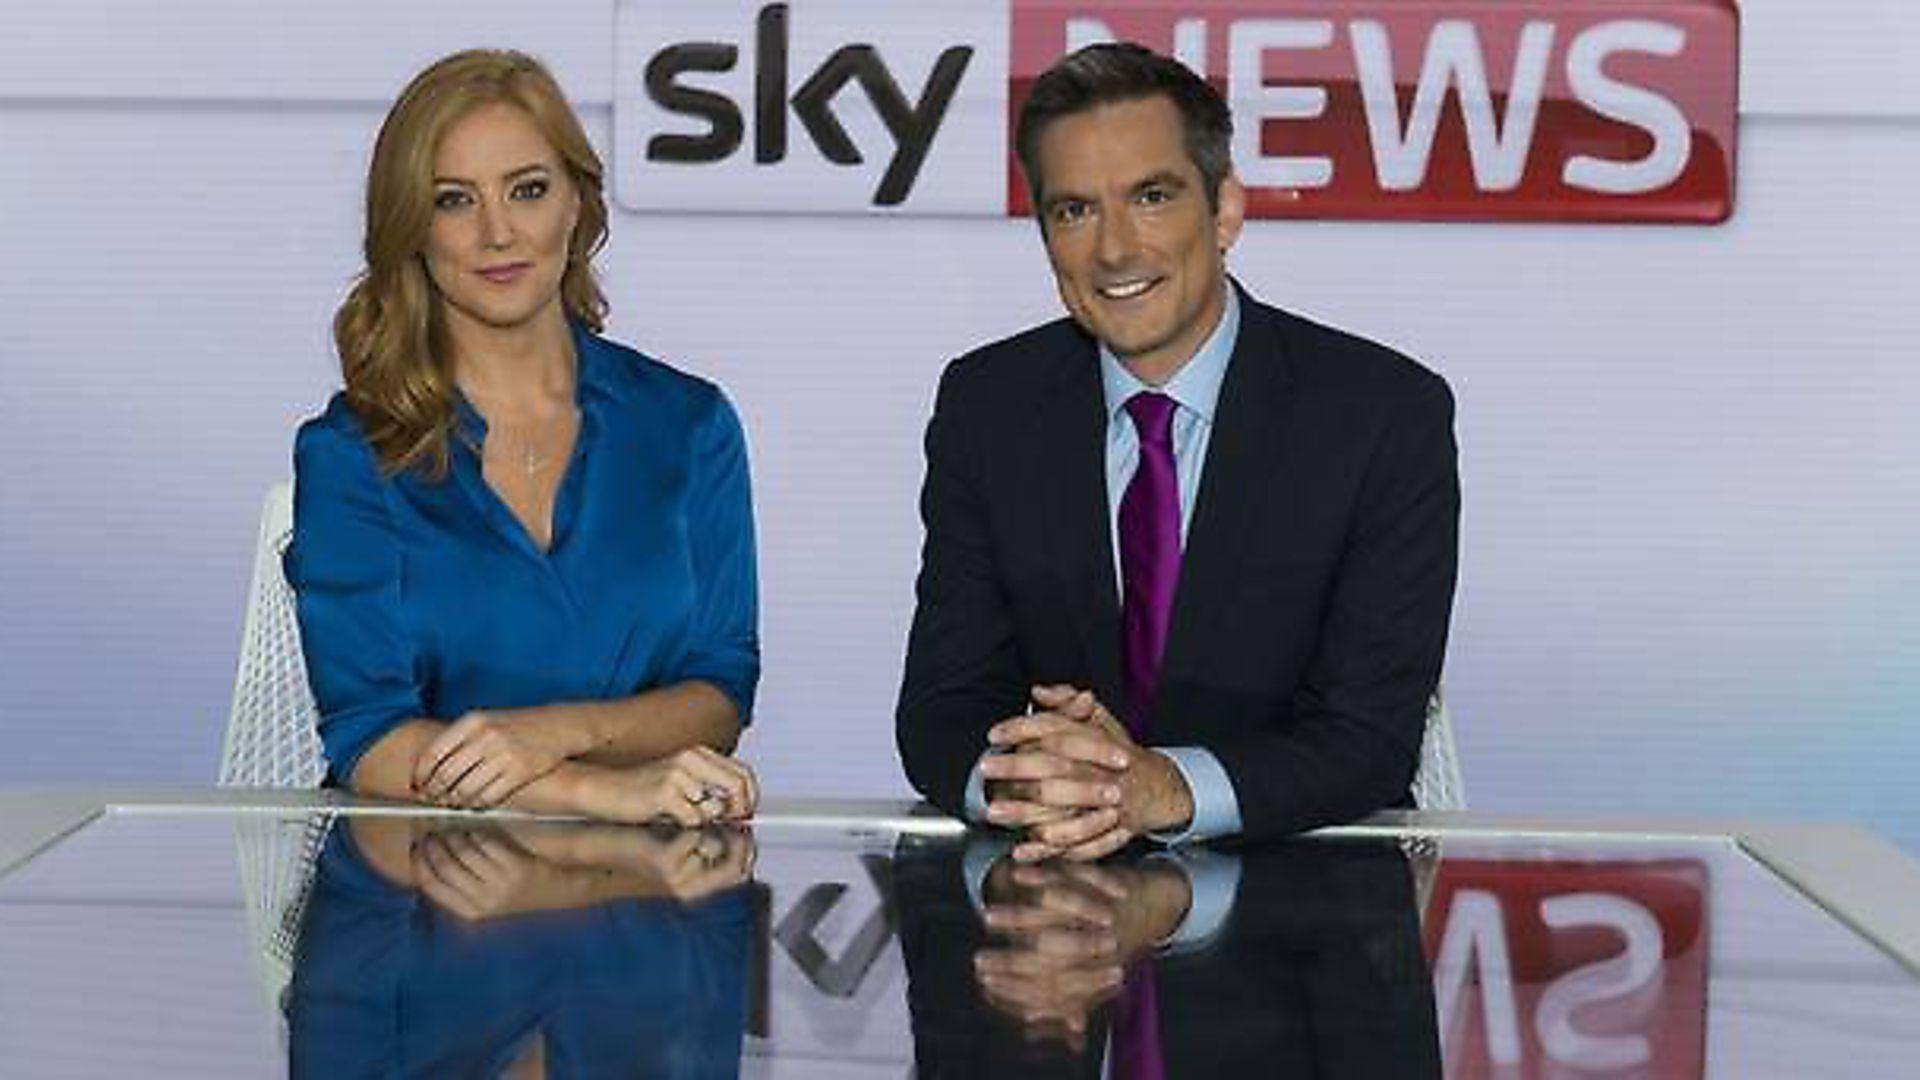 Sky News' Sarah-Jane Mee and Jonathan Samuels (Photograph: Sky/PA) - Credit: Archant